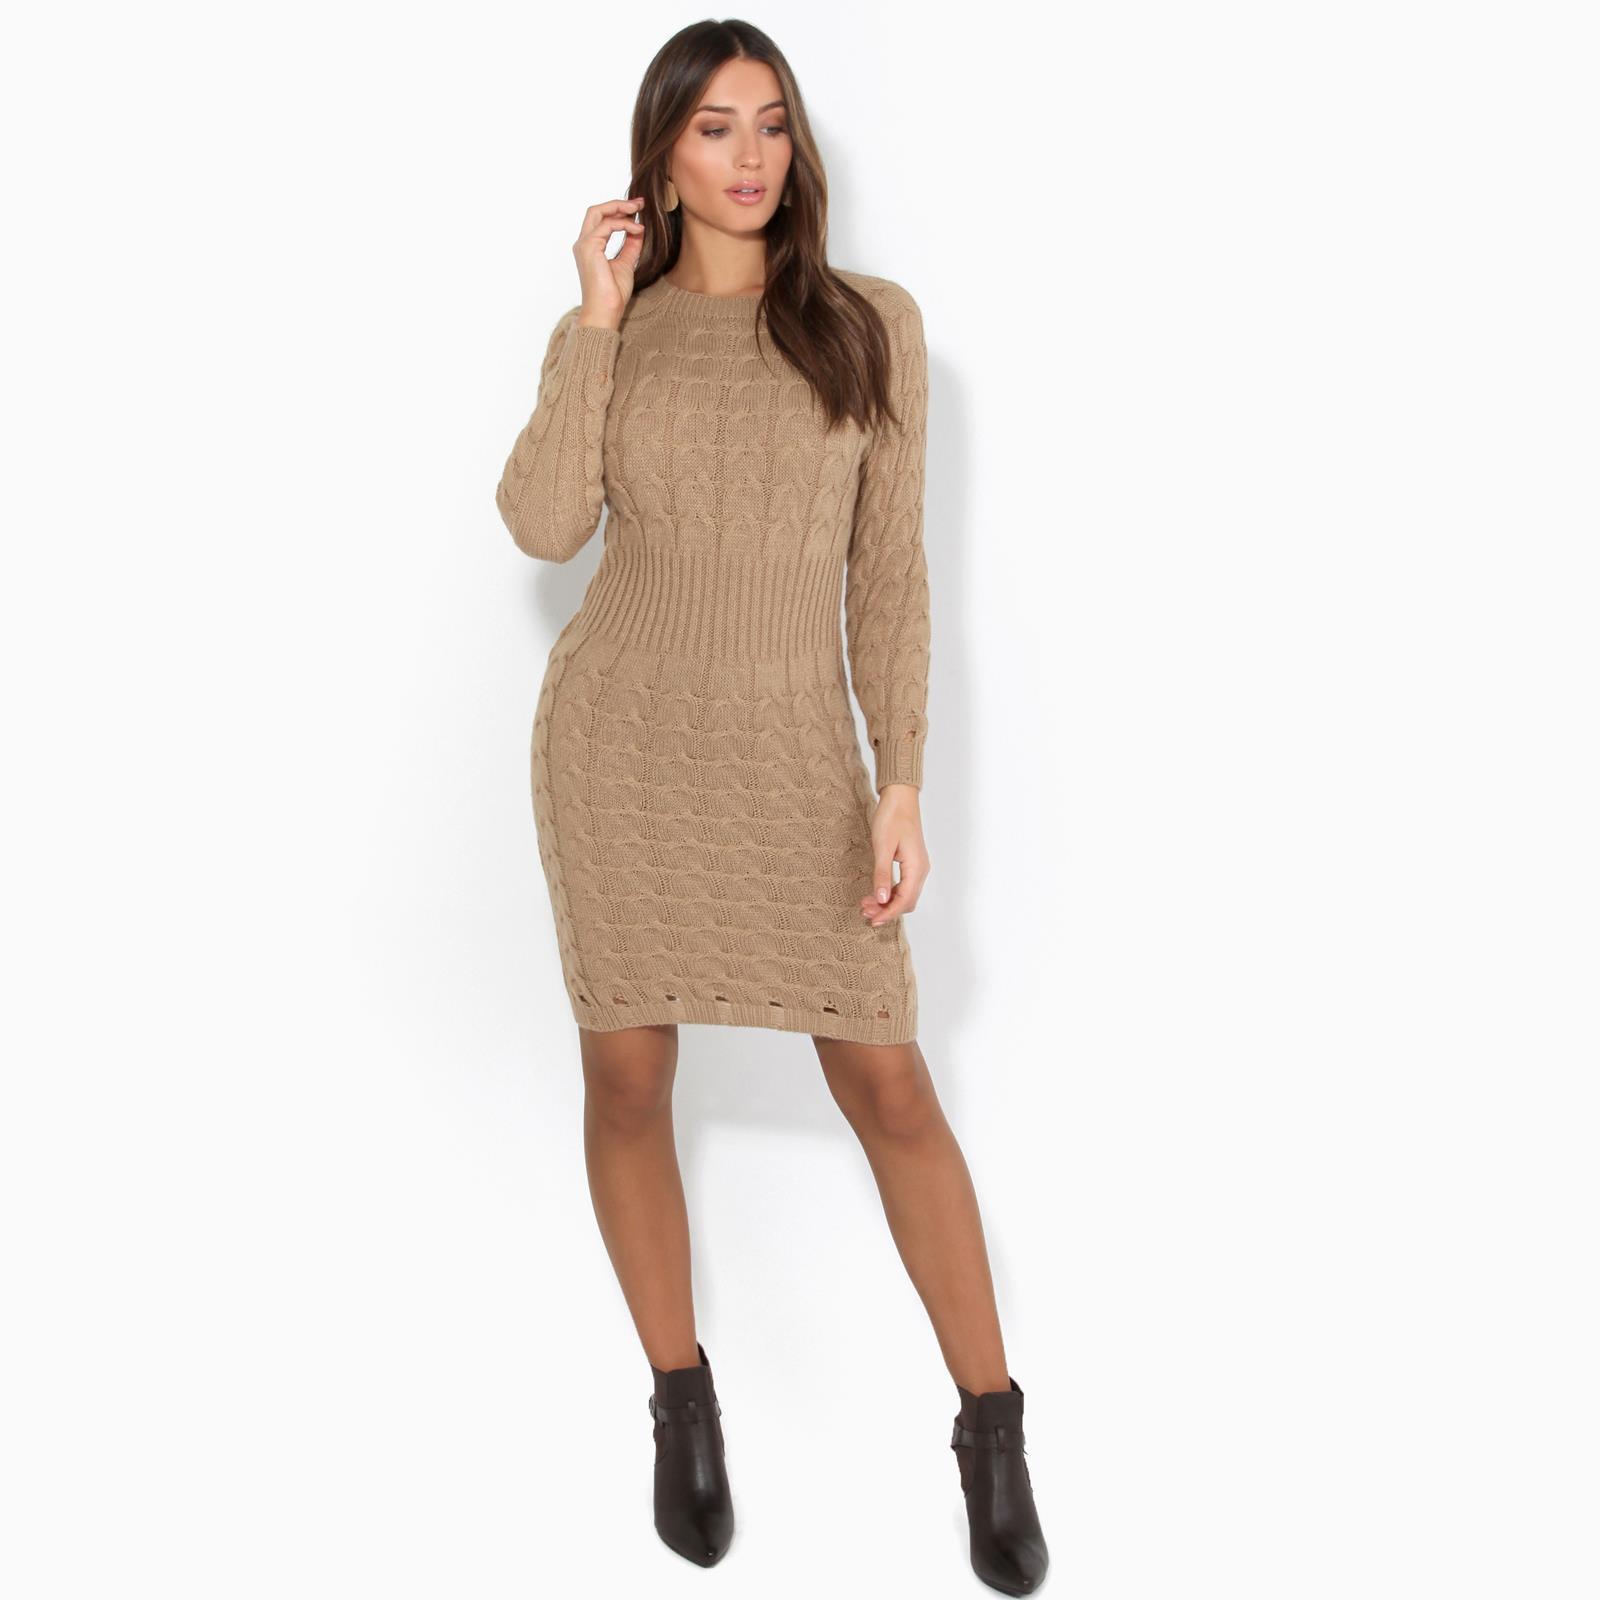 Womens-Ladies-Jumper-Dress-Longsleeve-Mini-Warm-Winter-Knit-Top-Bodycon thumbnail 9